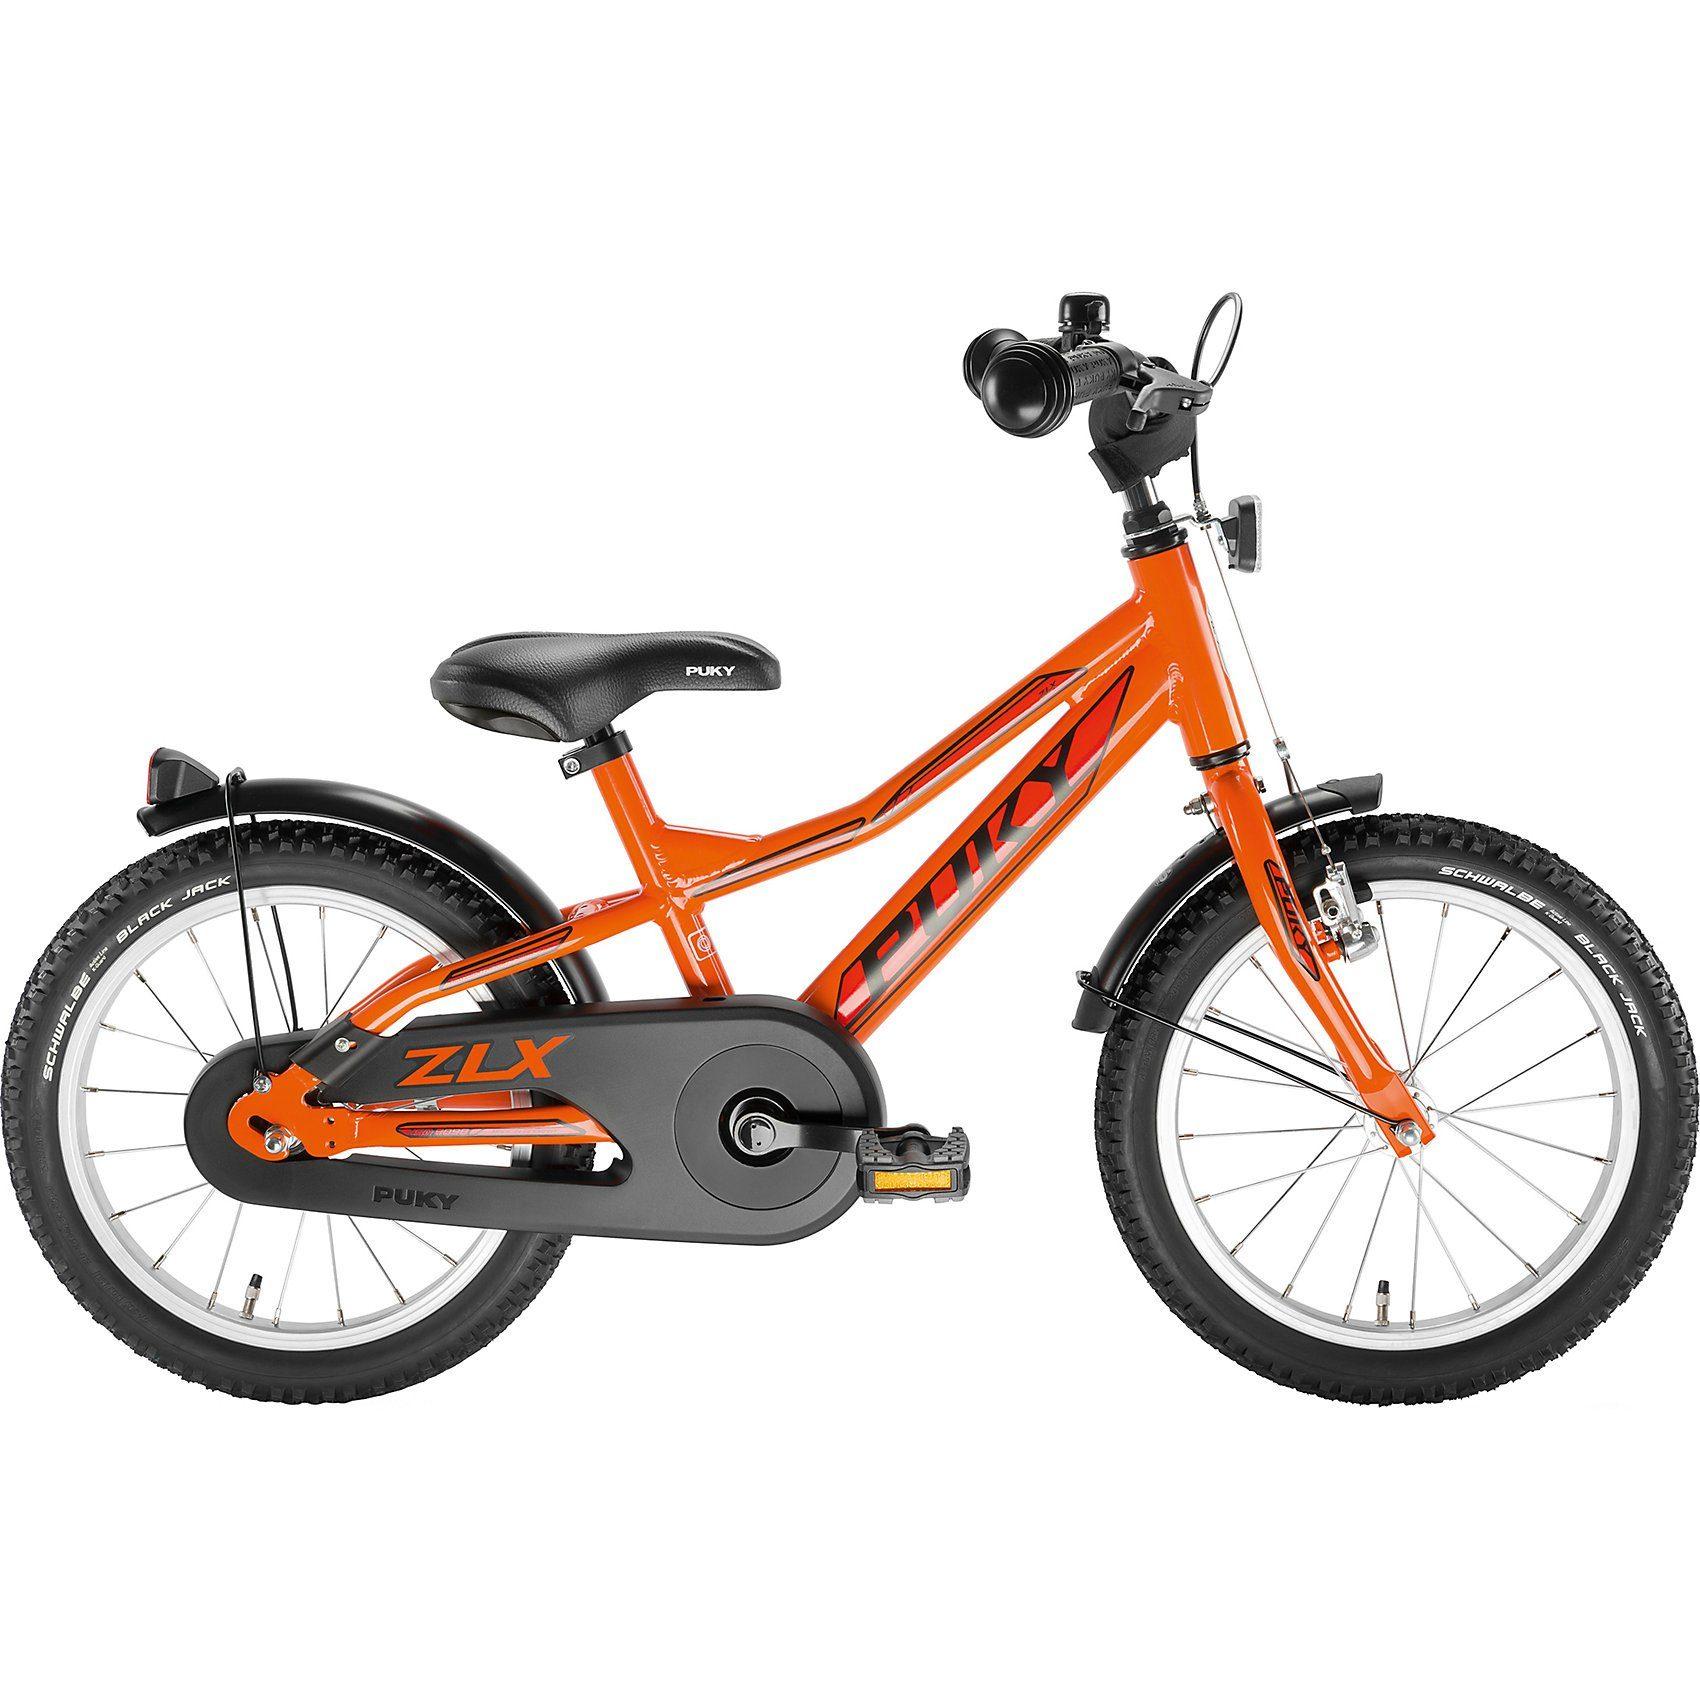 Puky Kinderfahrrad ZLX 16-1 Alu racing, orange